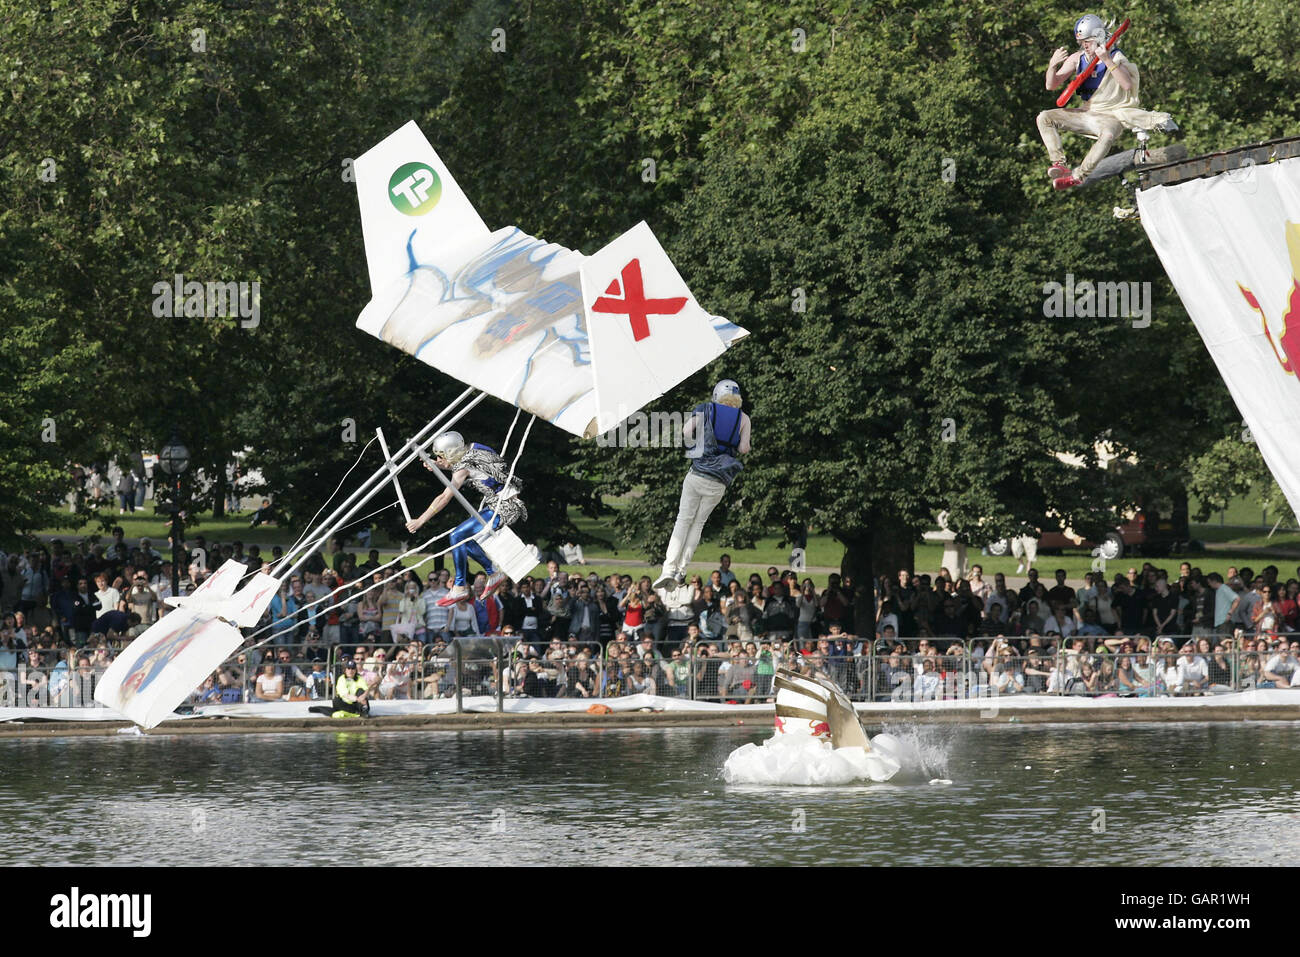 Red Bull Flugtag London - Stock Image